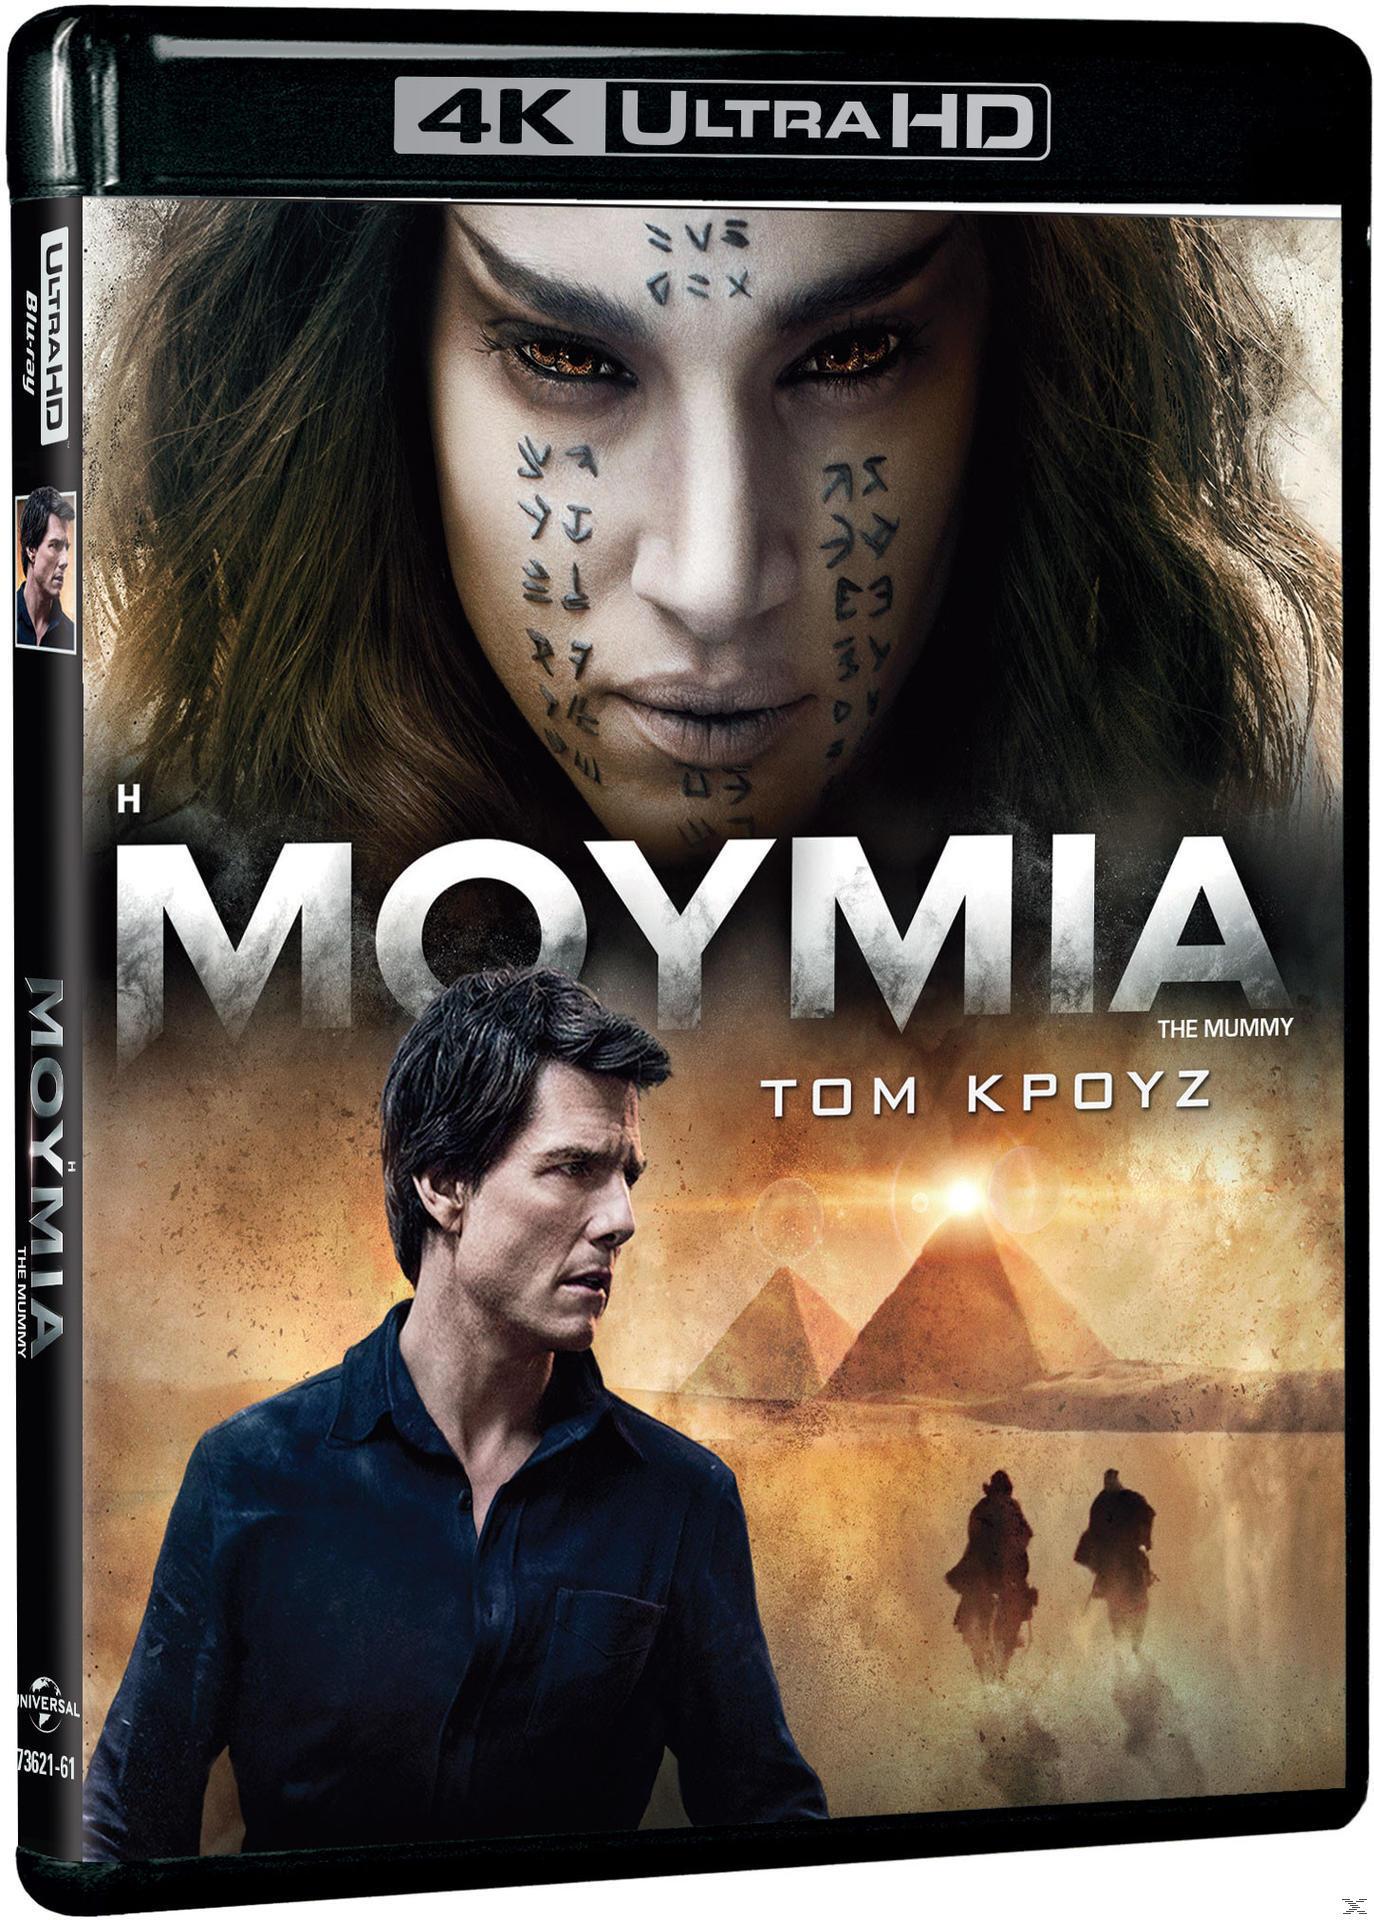 4K MOYMIA [BLU RAY]